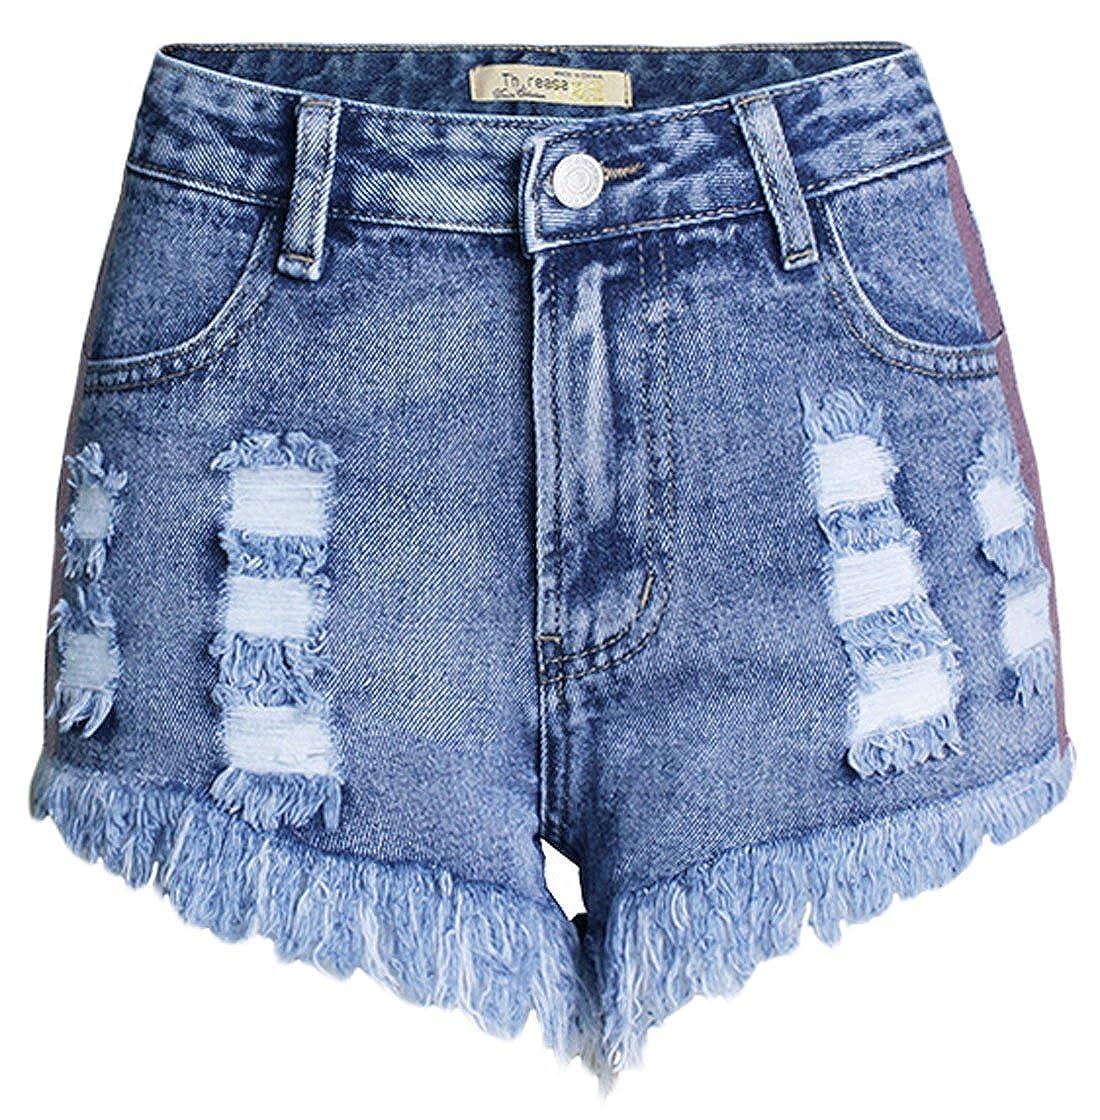 chouyatou Womens High-Waist Contrast Stripe Fringe Ripped Denim Shorts